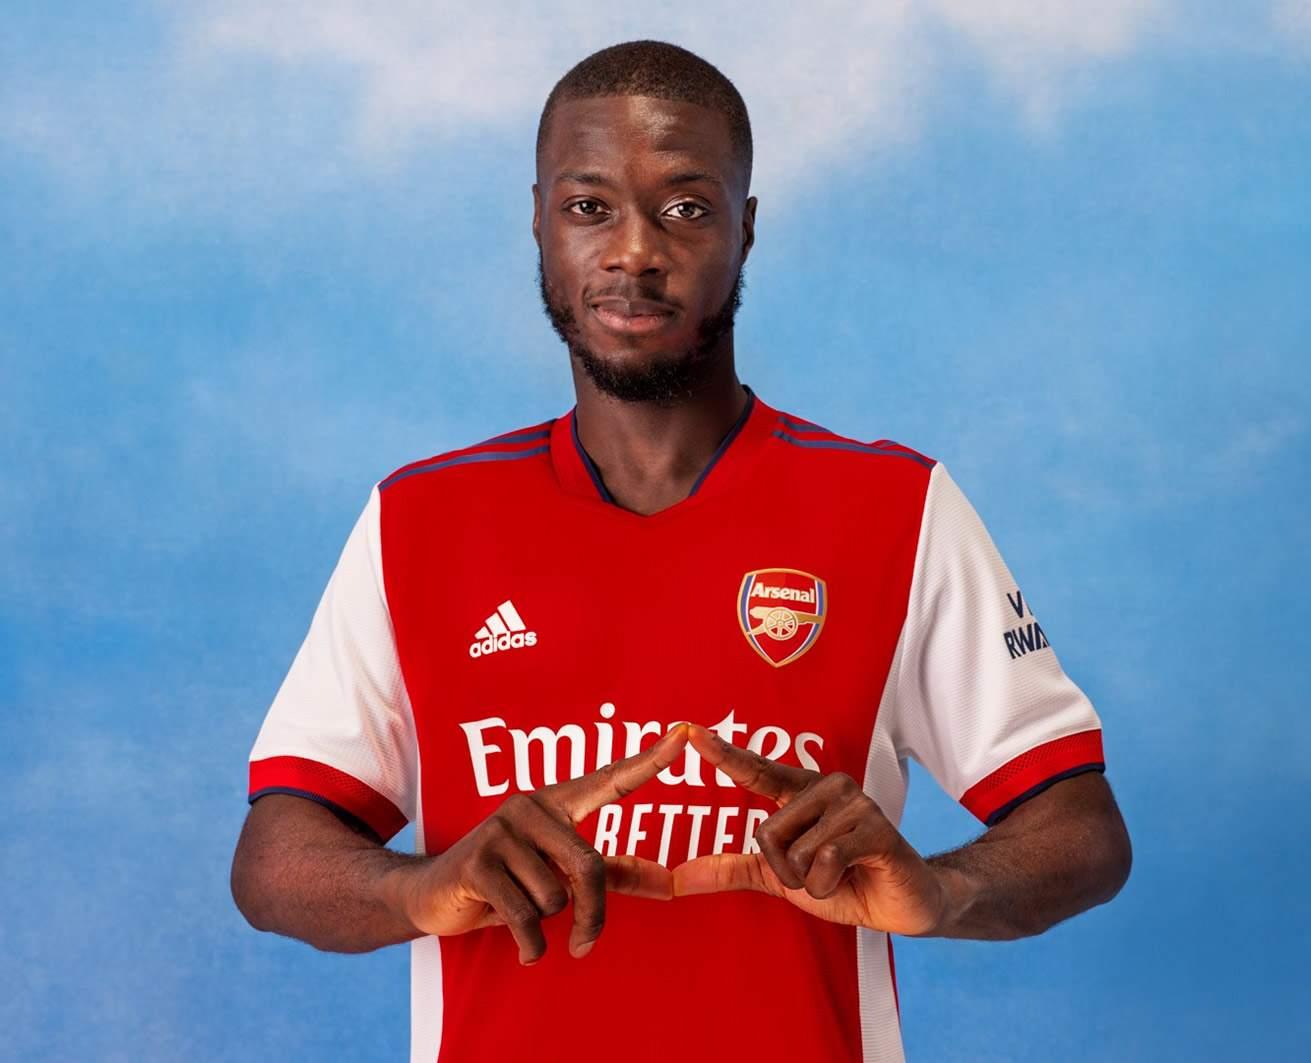 Camiseta adidas del Arsenal 2021/22